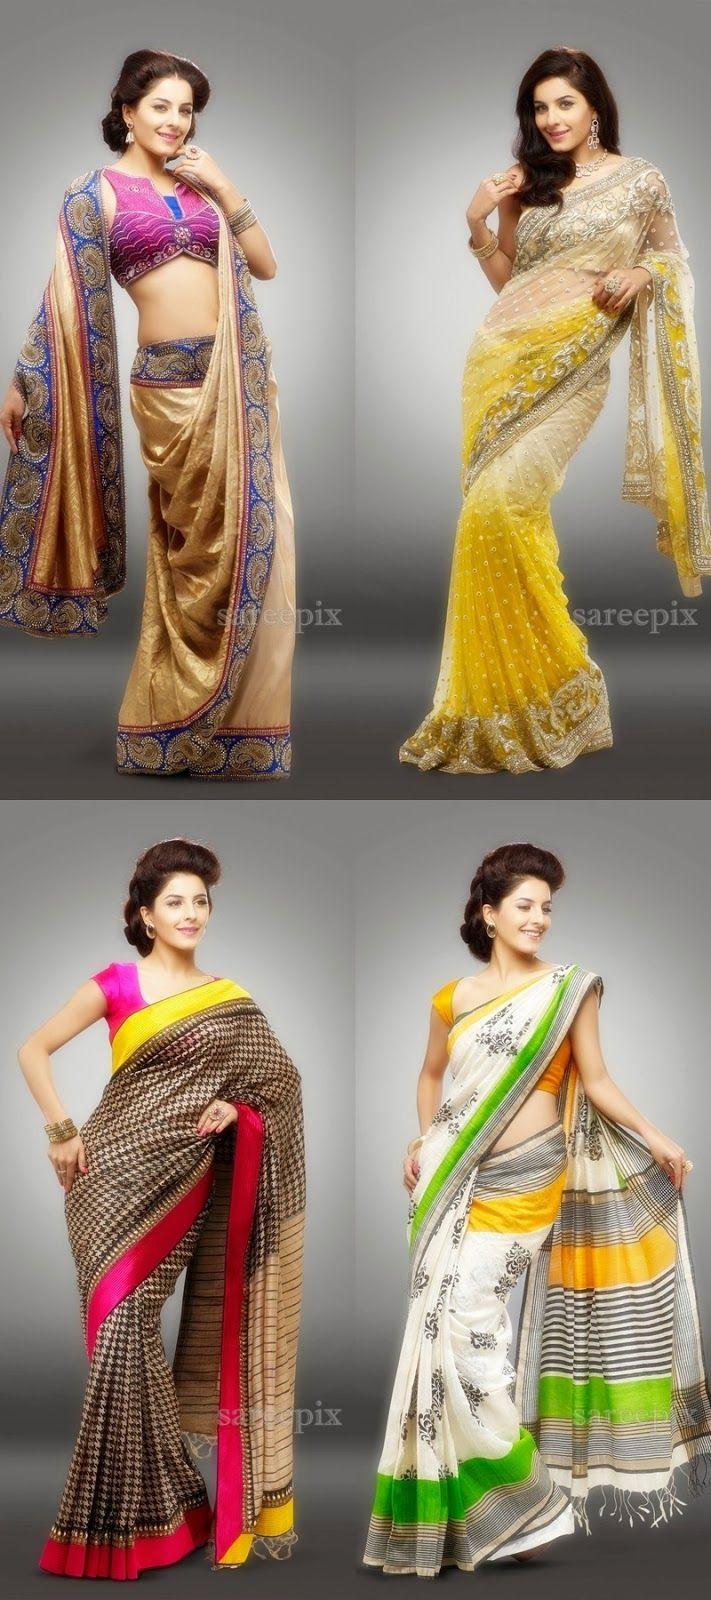 Telugu actress Isha talwar in sarees and lehengas